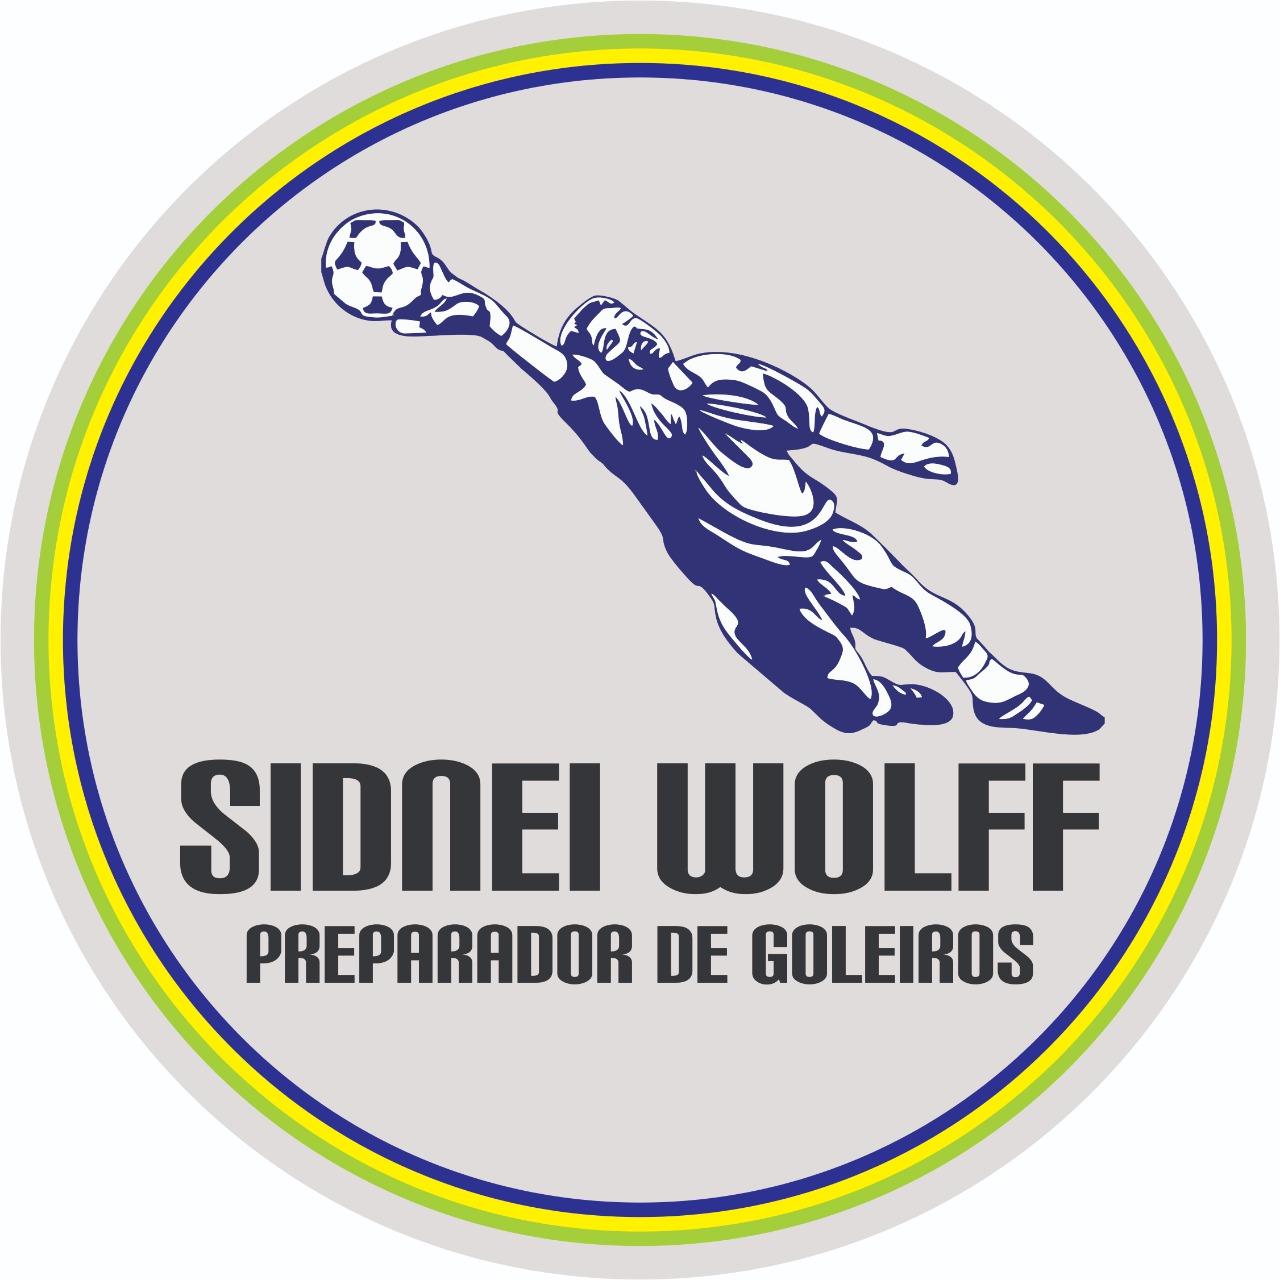 Sidnei Wolff - Preparador de Goleiros